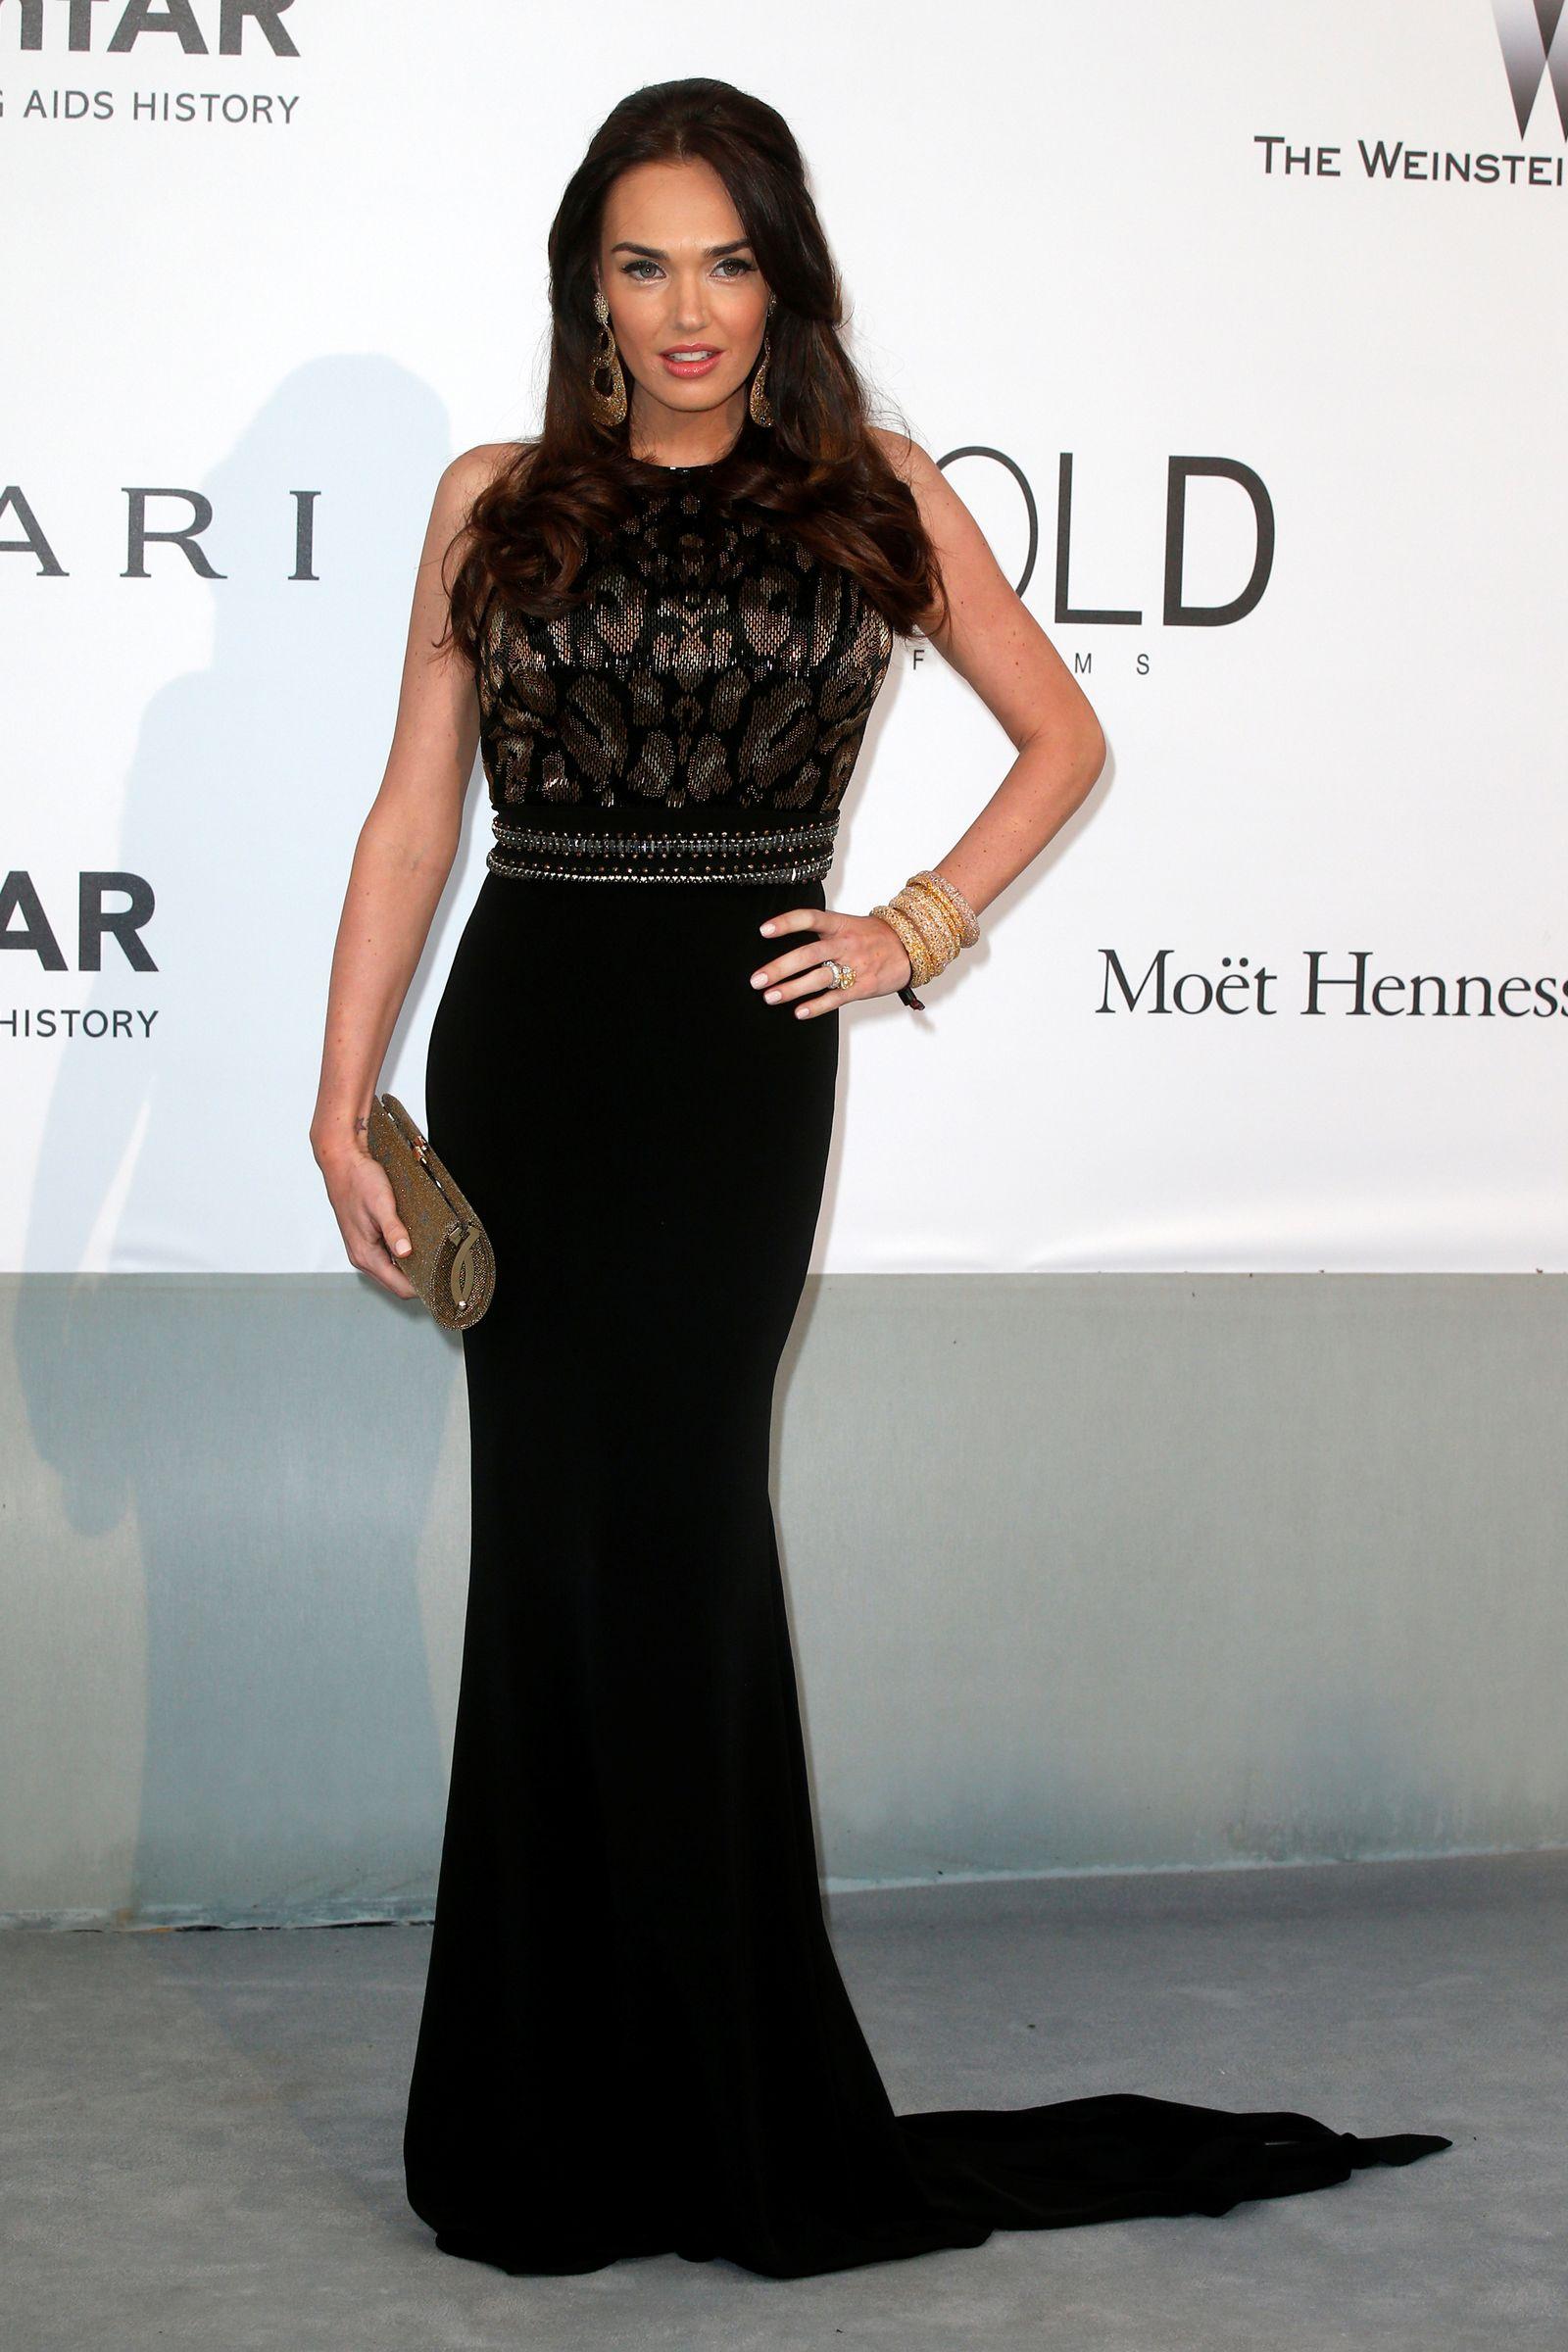 FILE PHOTO: Burglars nab jewellery worth $64 mln from British celeb Tamara Ecclestone